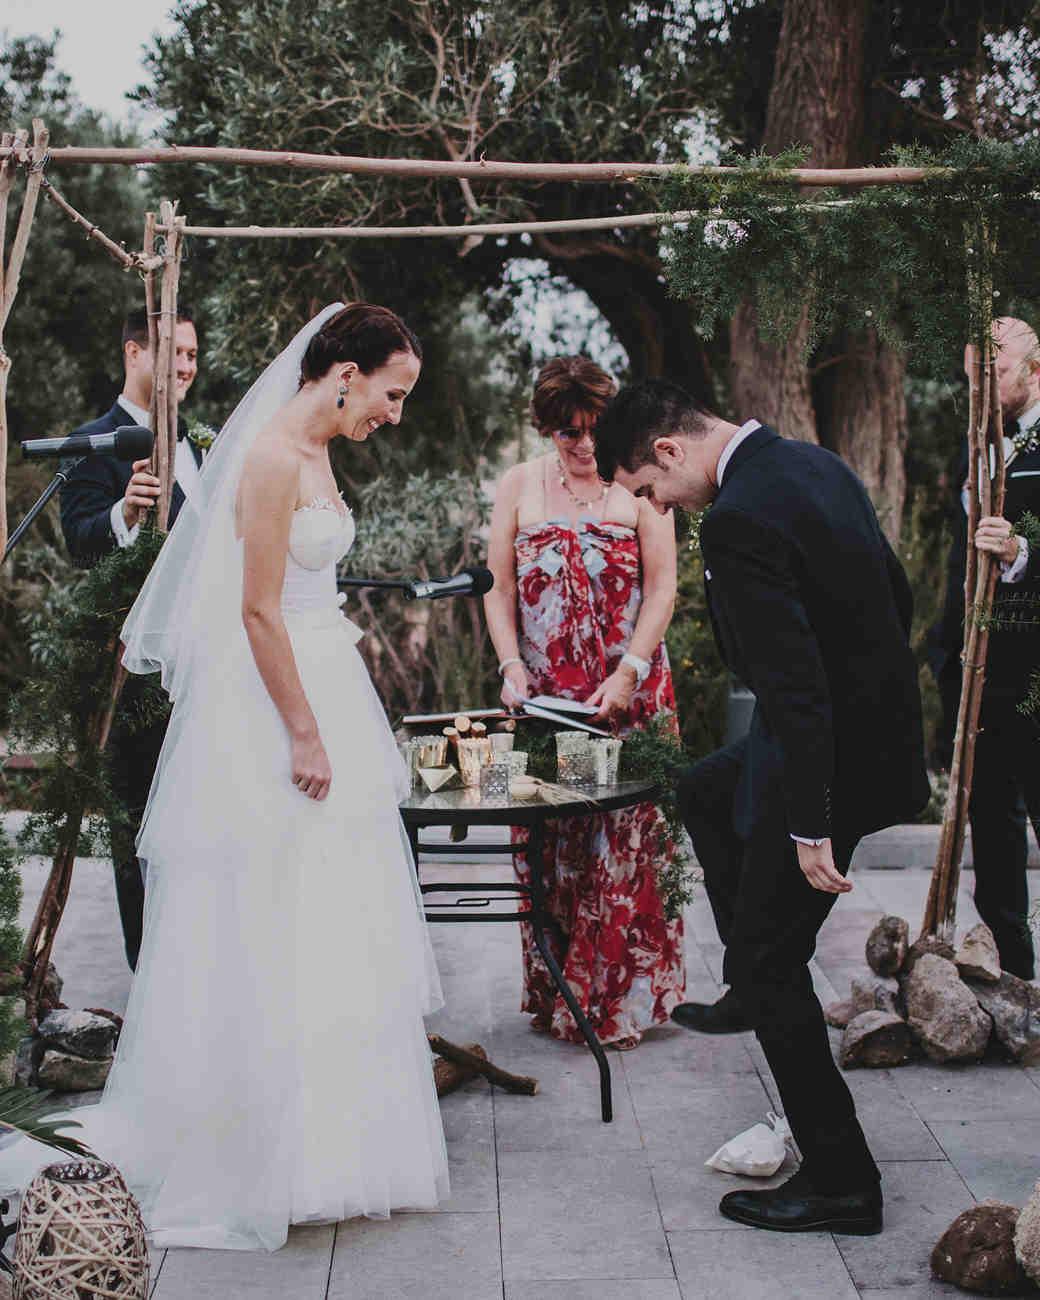 tamara-brett-wedding-ceremony-1235-s112120-0915.jpg